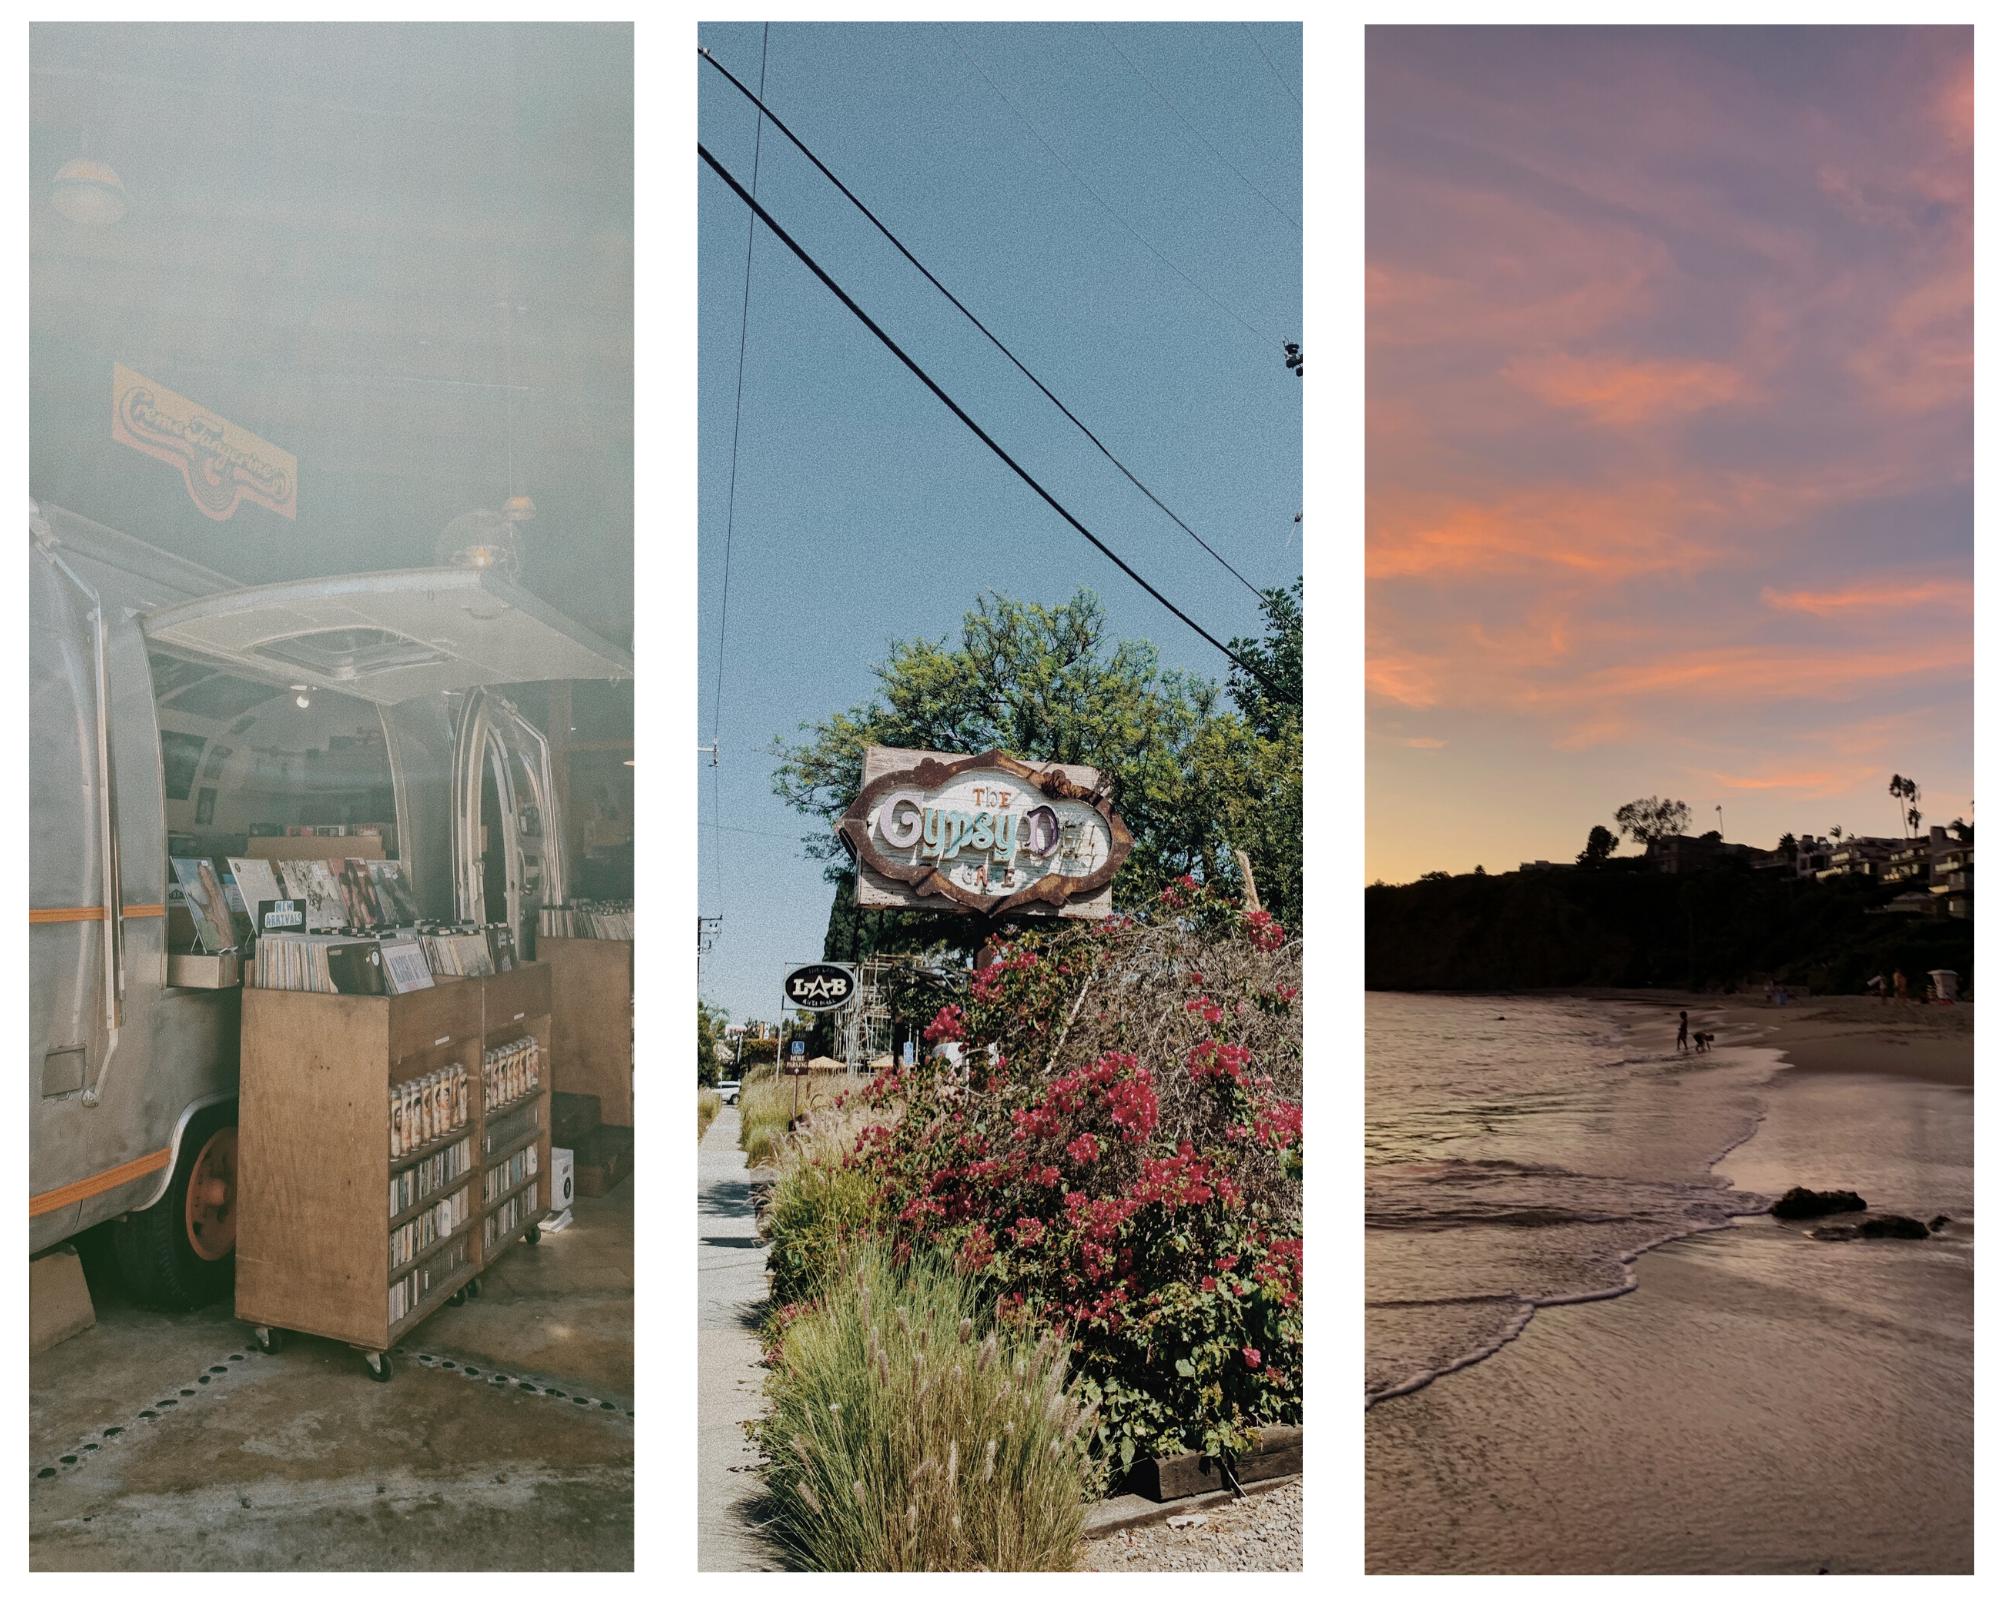 Newport Beach and Costa Mesa, the Anti-Mall and Gypsy Den Restaurant